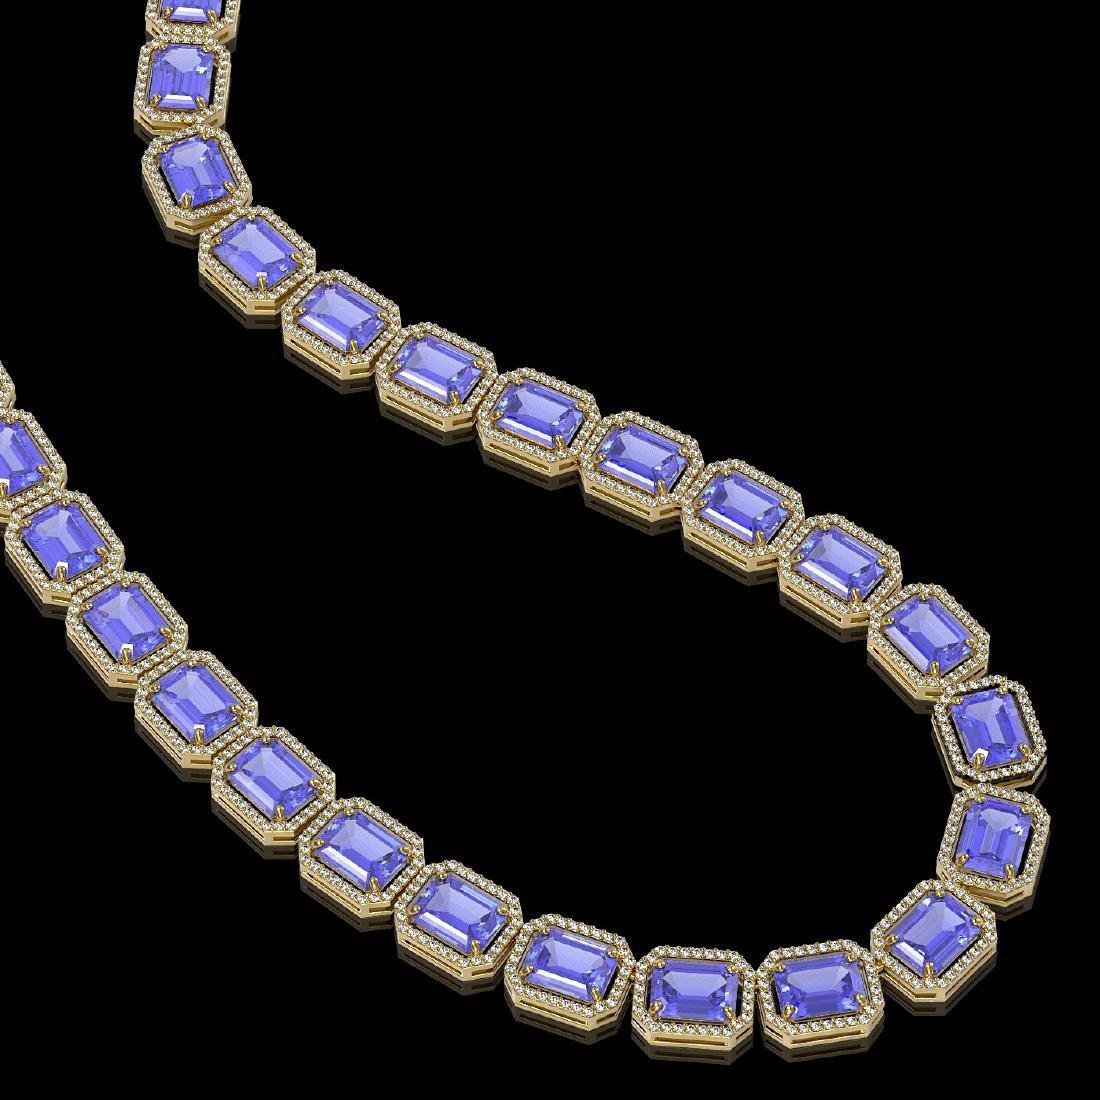 79.99 CTW Tanzanite & Diamond Halo Necklace 10K Yellow - 2